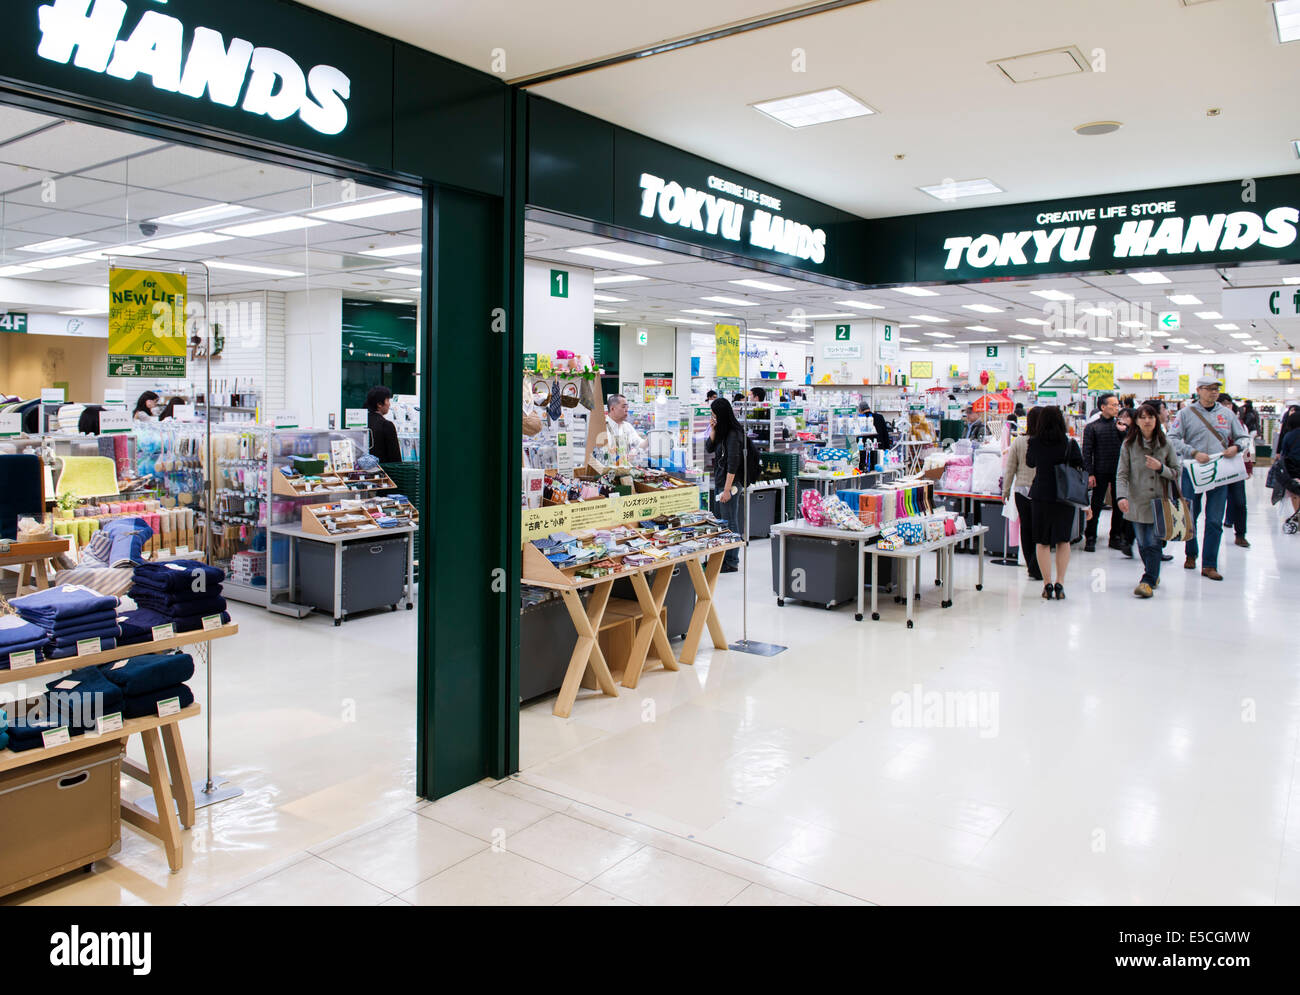 Tokyu Hands Stock Photos & Tokyu Hands Stock Images - Alamy